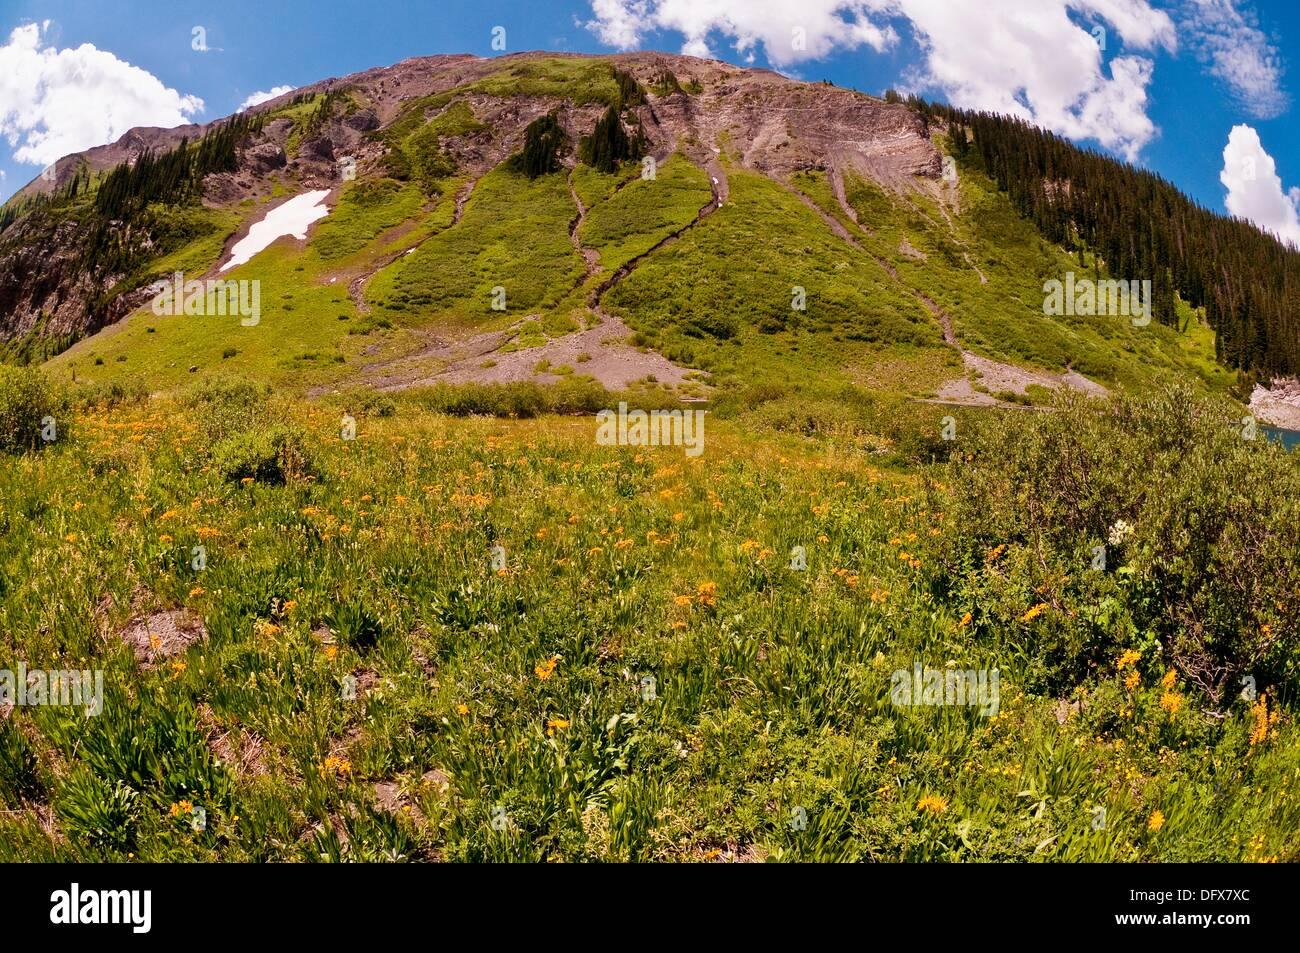 Wildflowers, Emerald Lake, near Crested Butte, Colorado USA - Stock Image